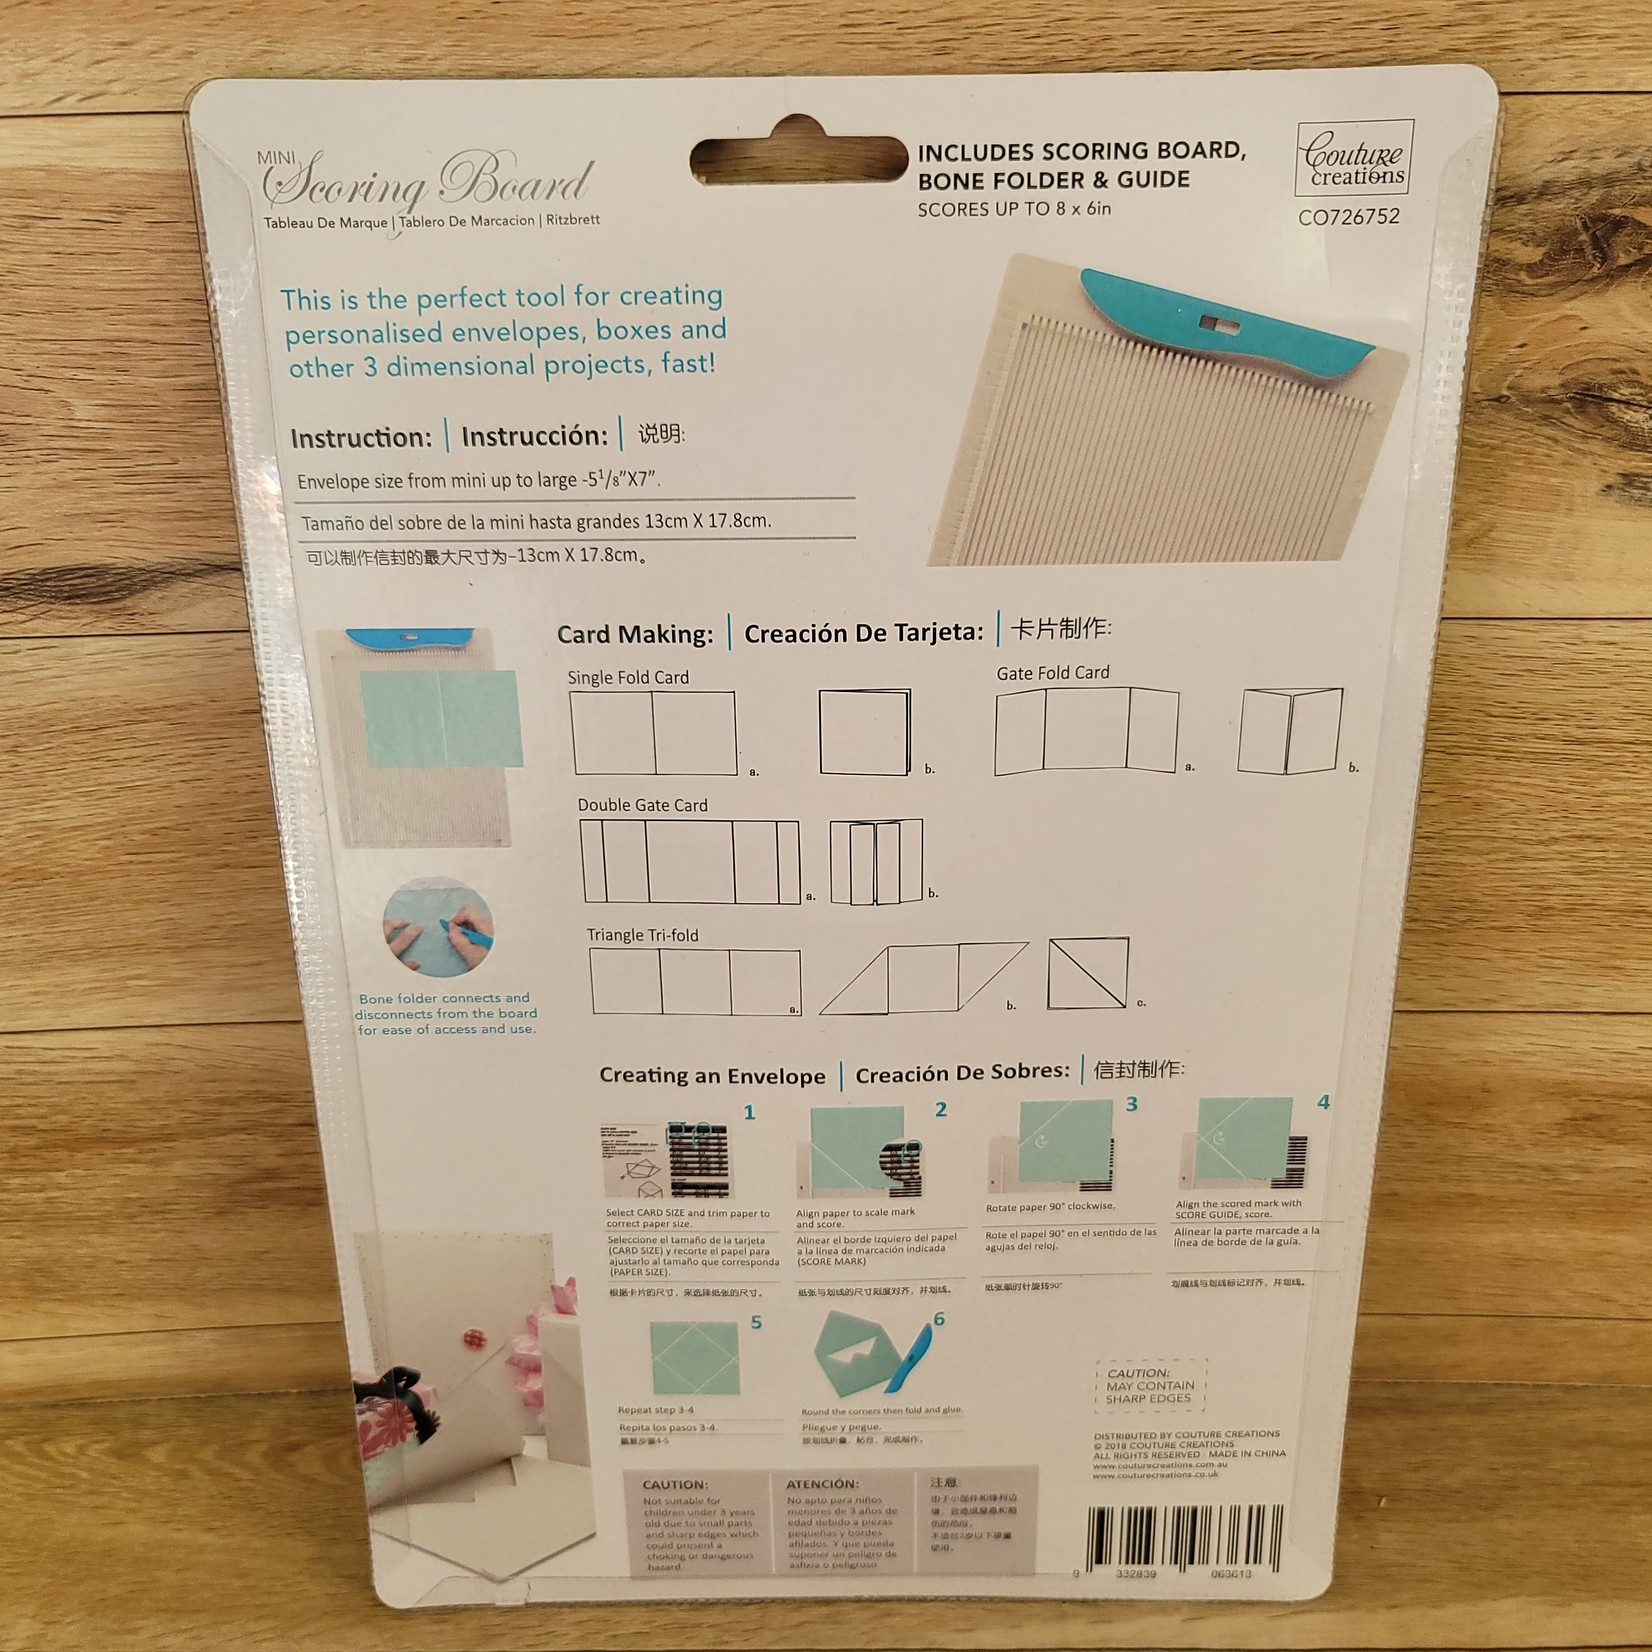 "Couture creations - Mini Scoring Board 8"" x 6"""